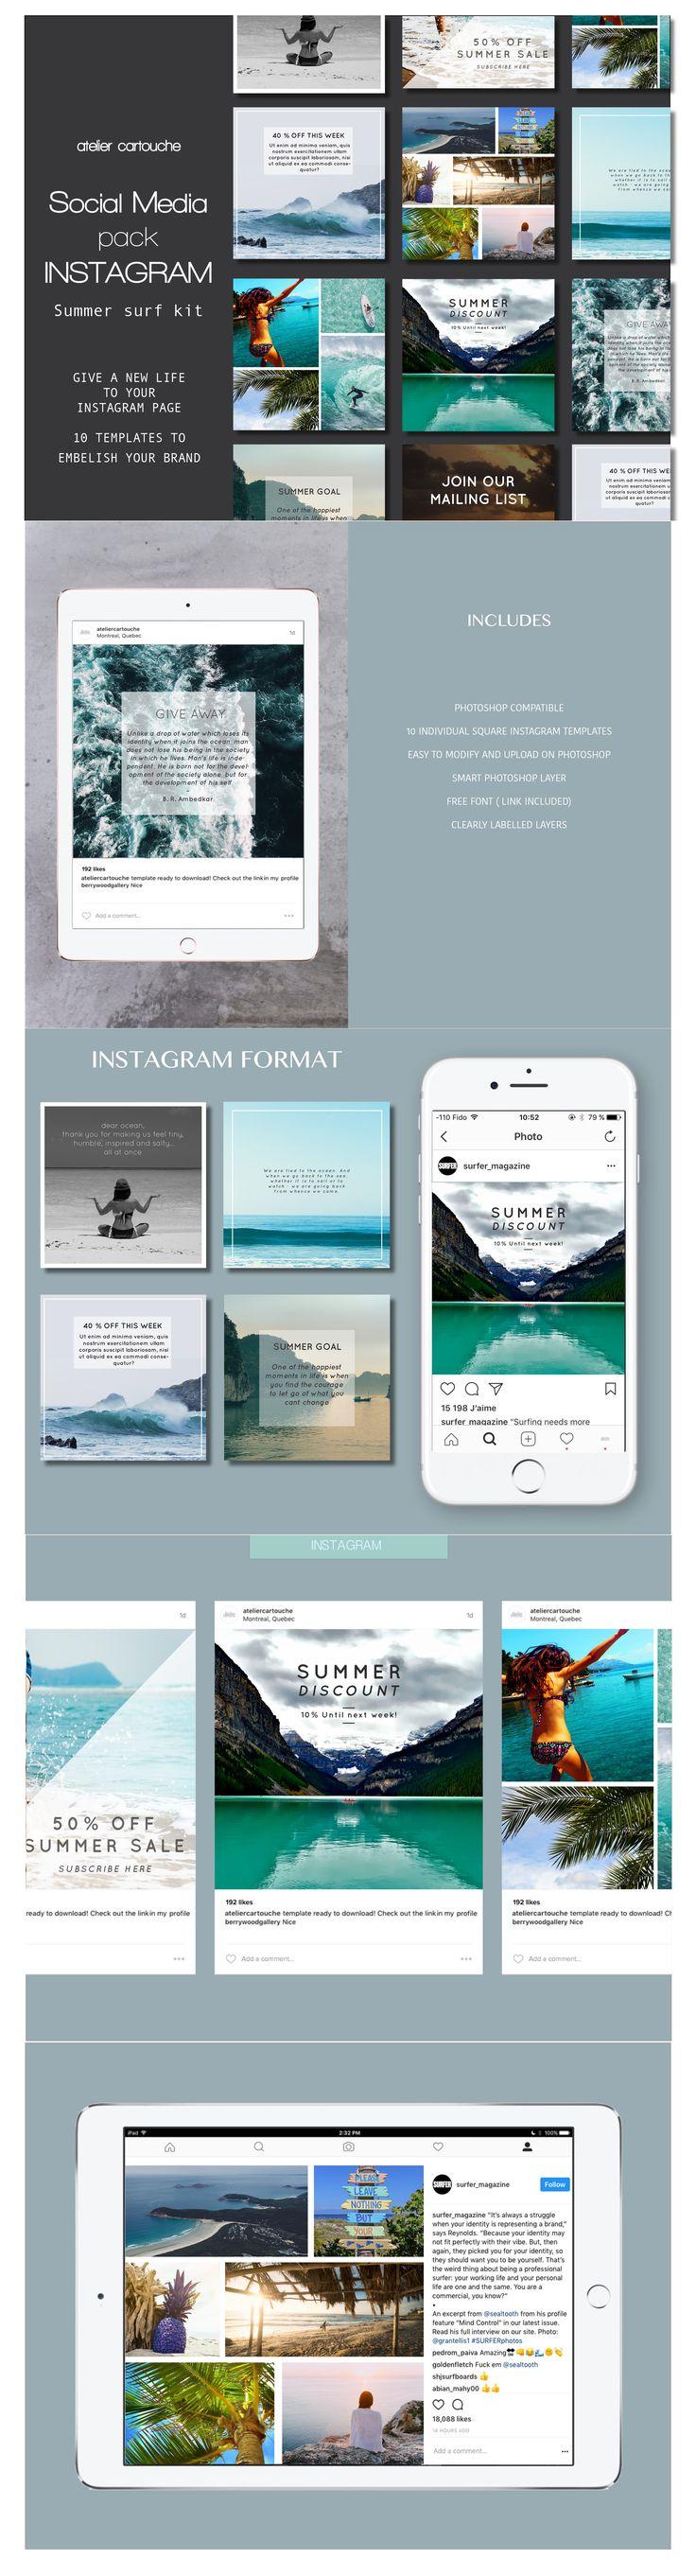 21 best instagram social media templates images on pinterest